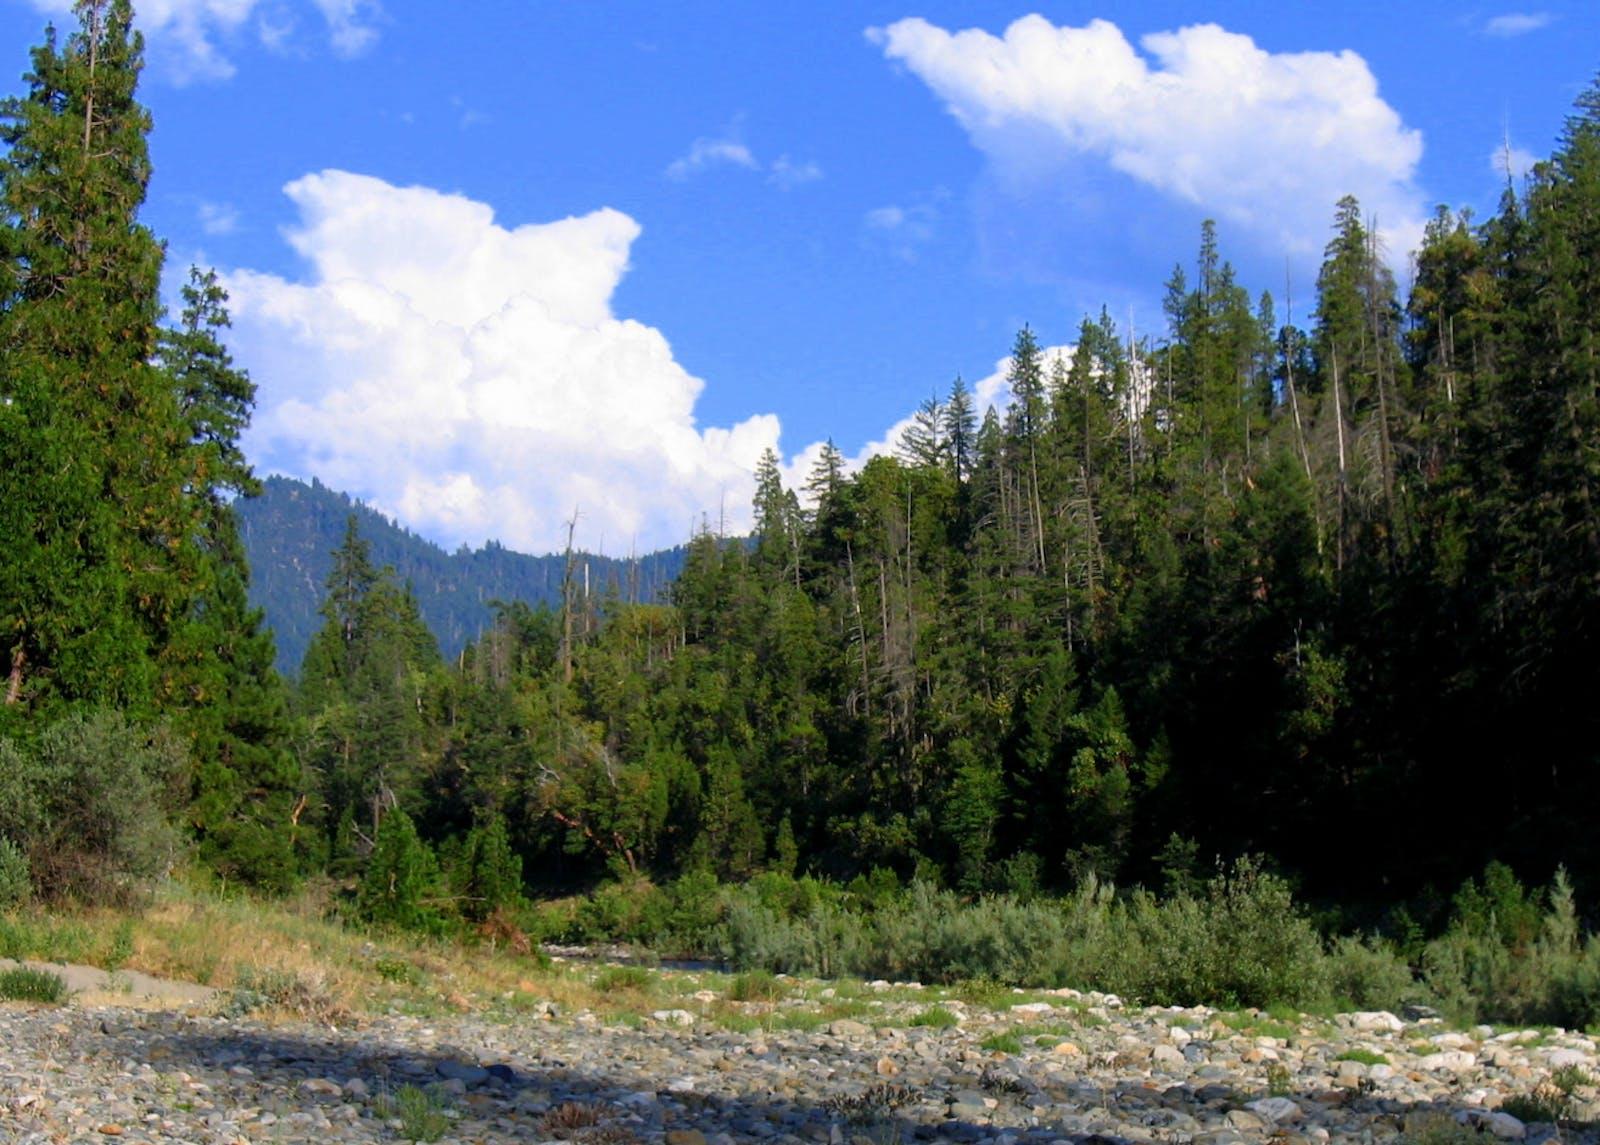 Northern California Coastal Forests